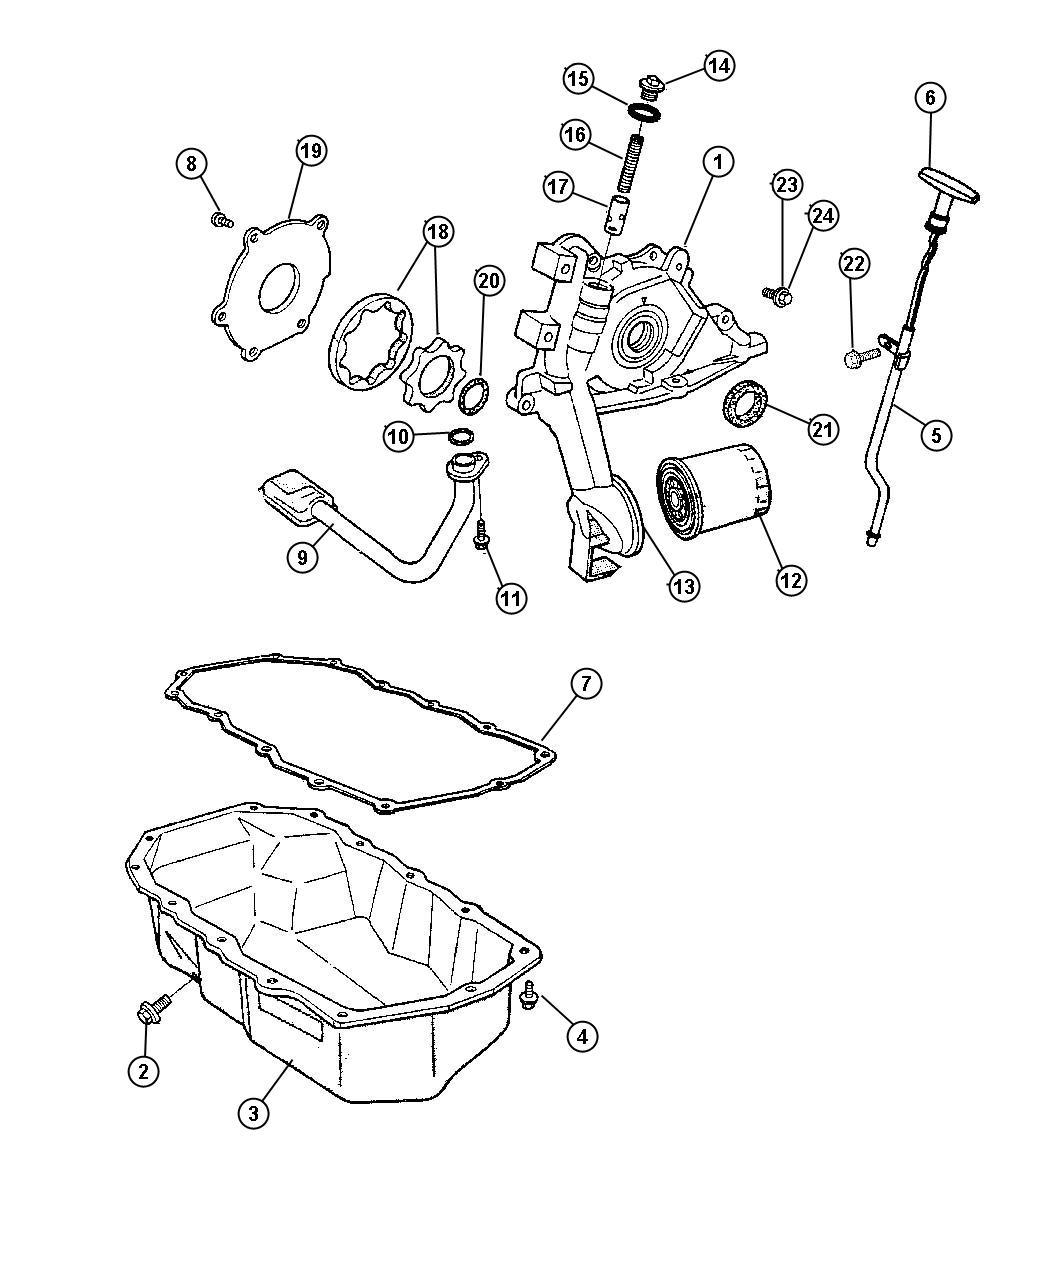 Chrysler Pt Cruiser Bolt Used For Screw And Washer Hex